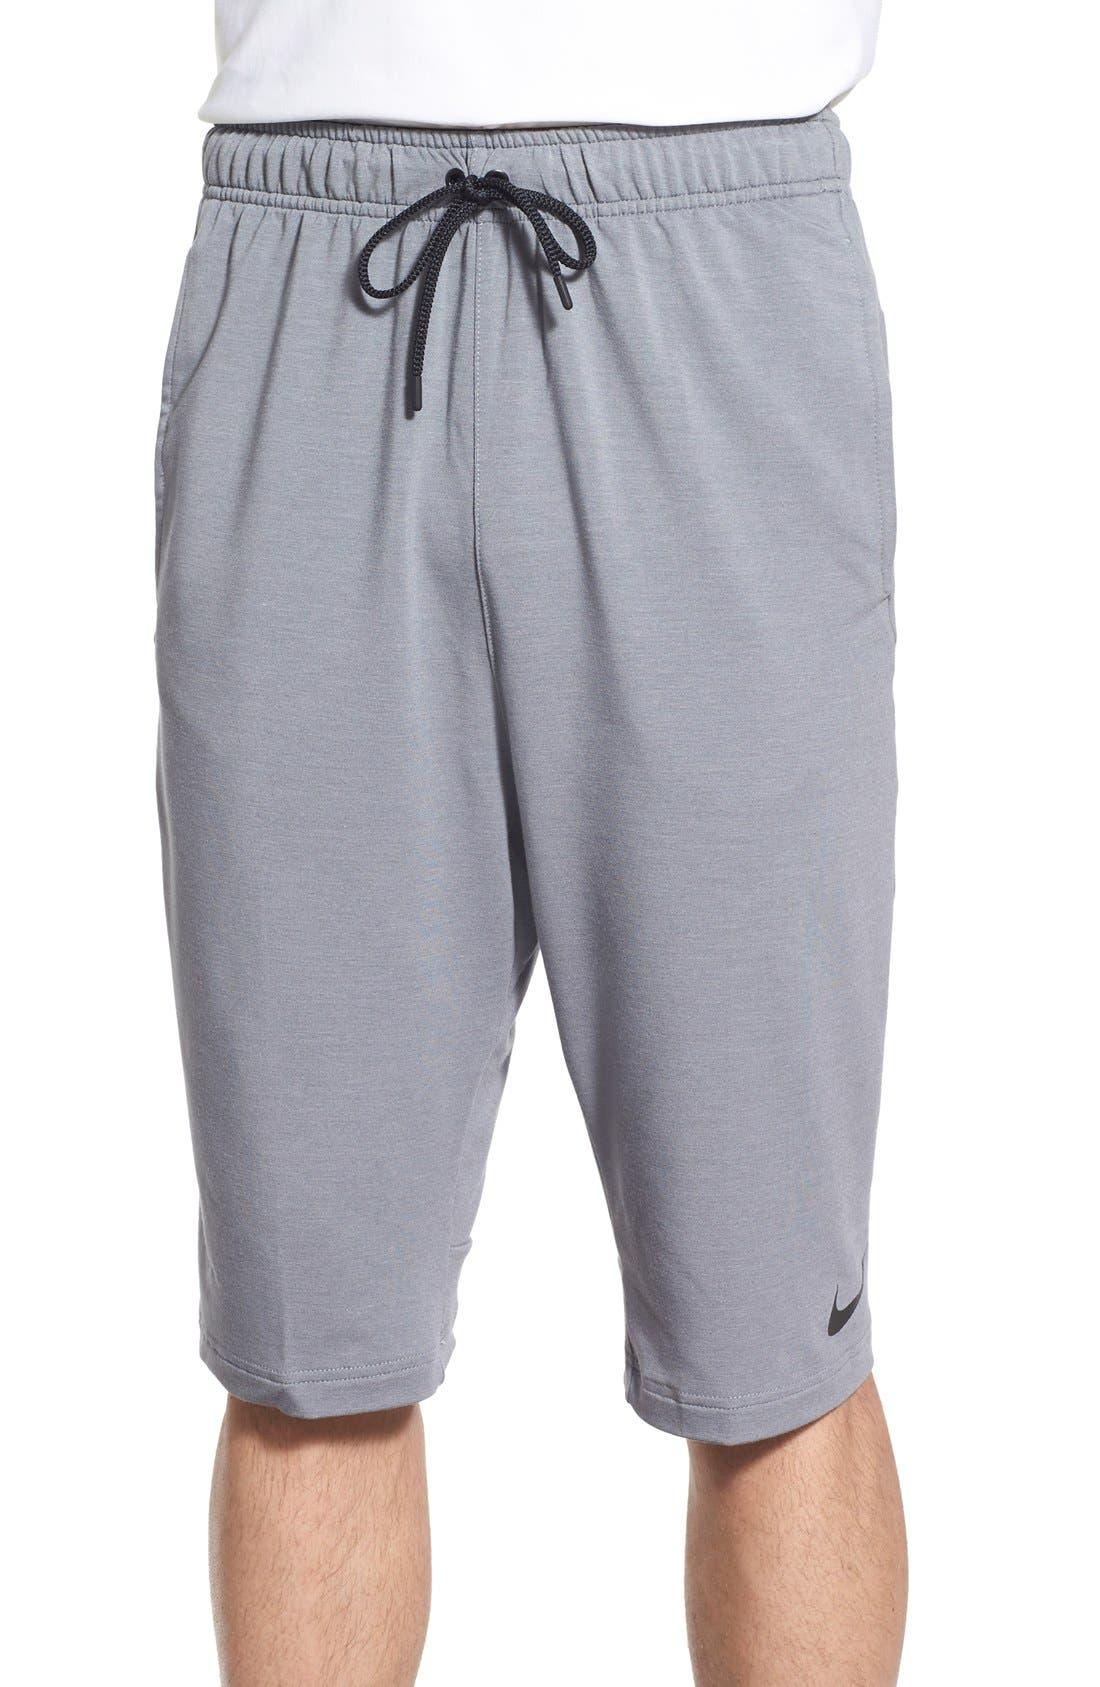 Nike Dri-FIT Fleece Training Shorts | Nordstrom